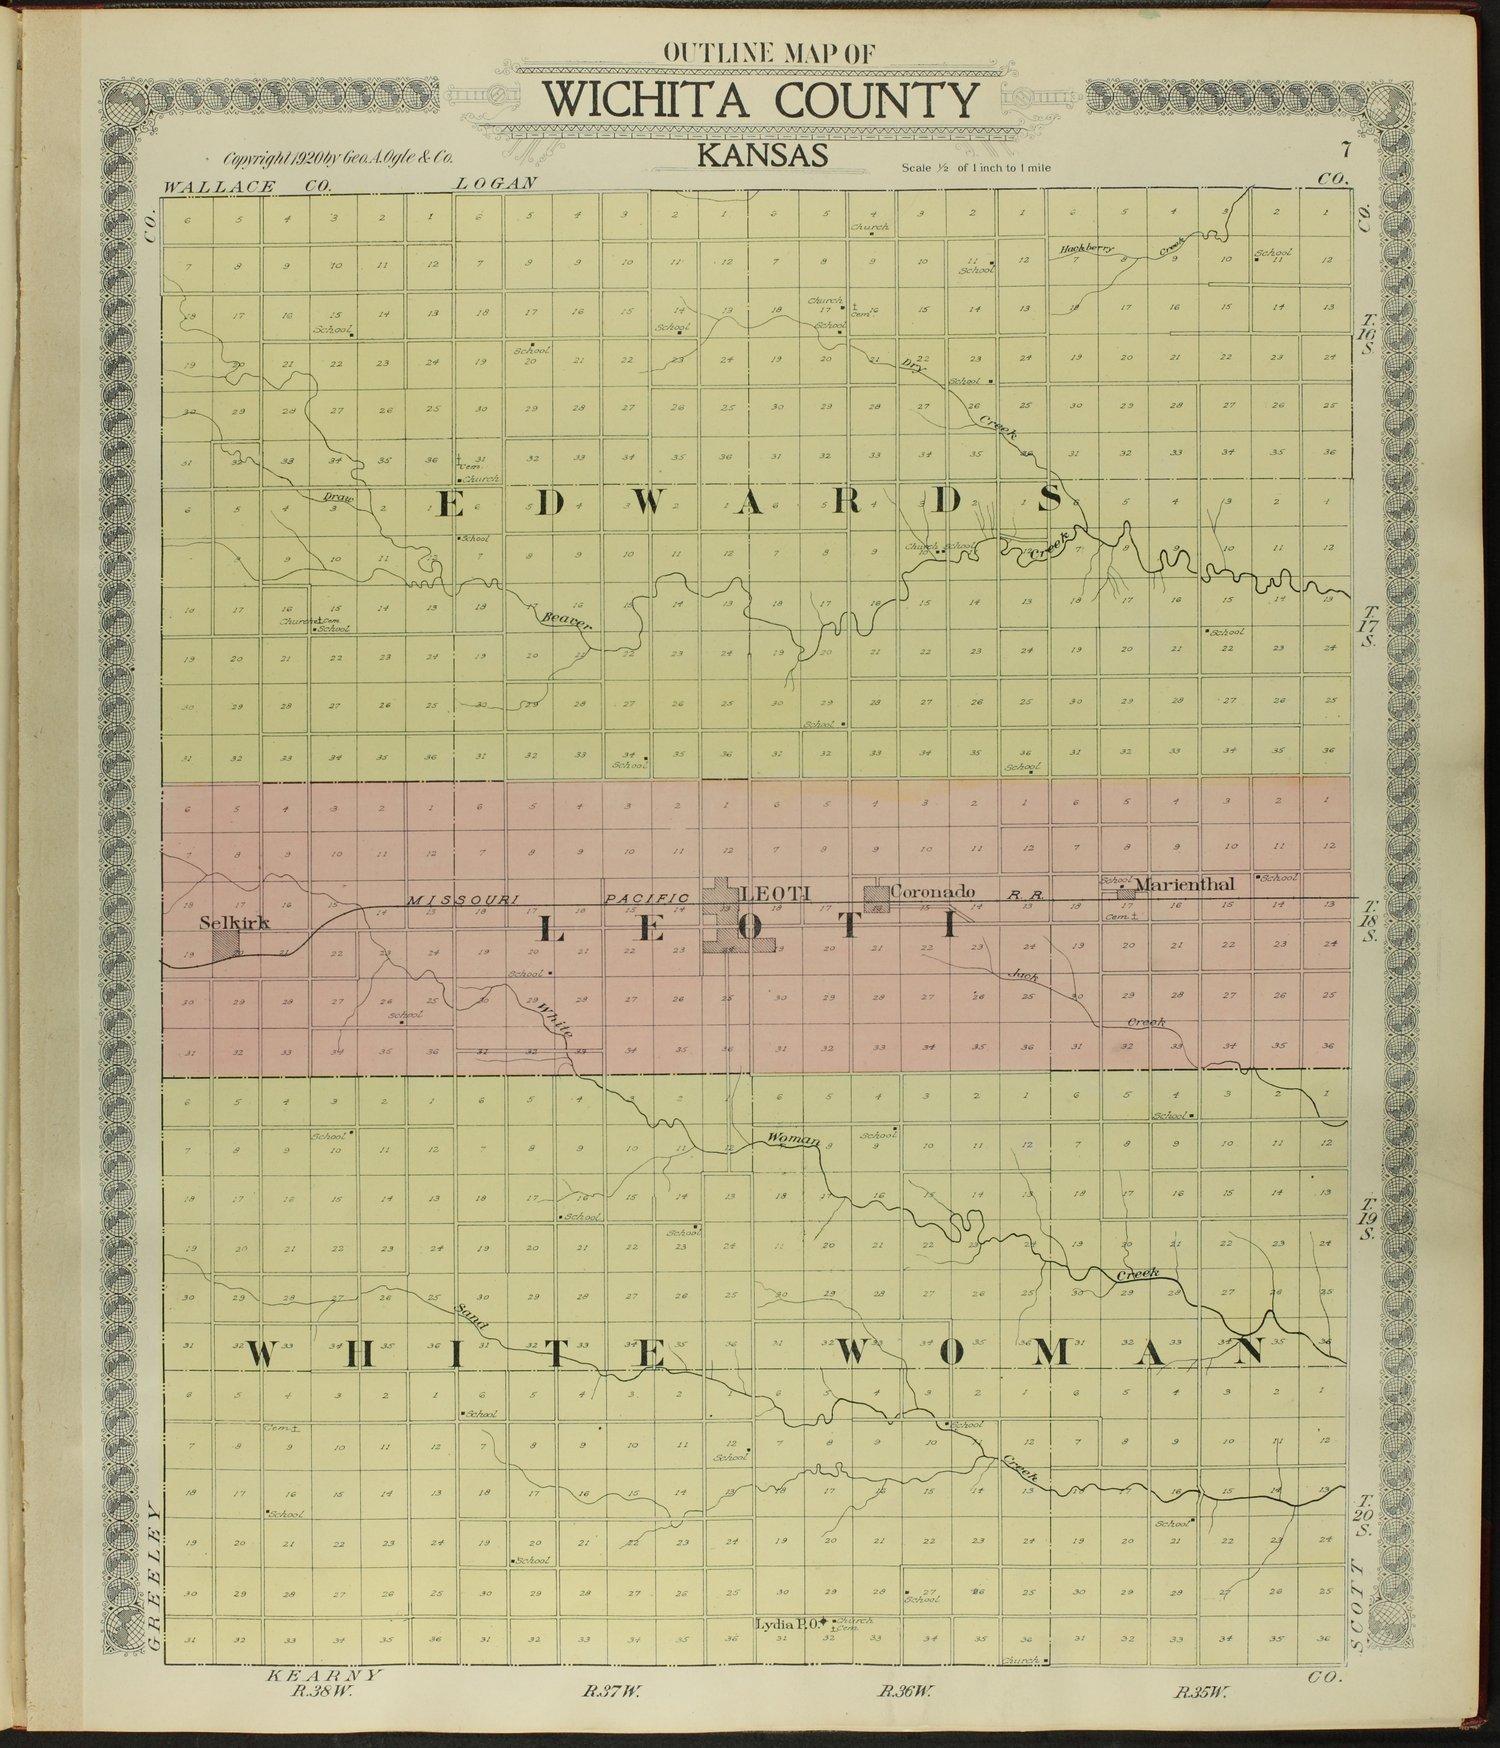 Standard atlas of Wichita County, Kansas - 7